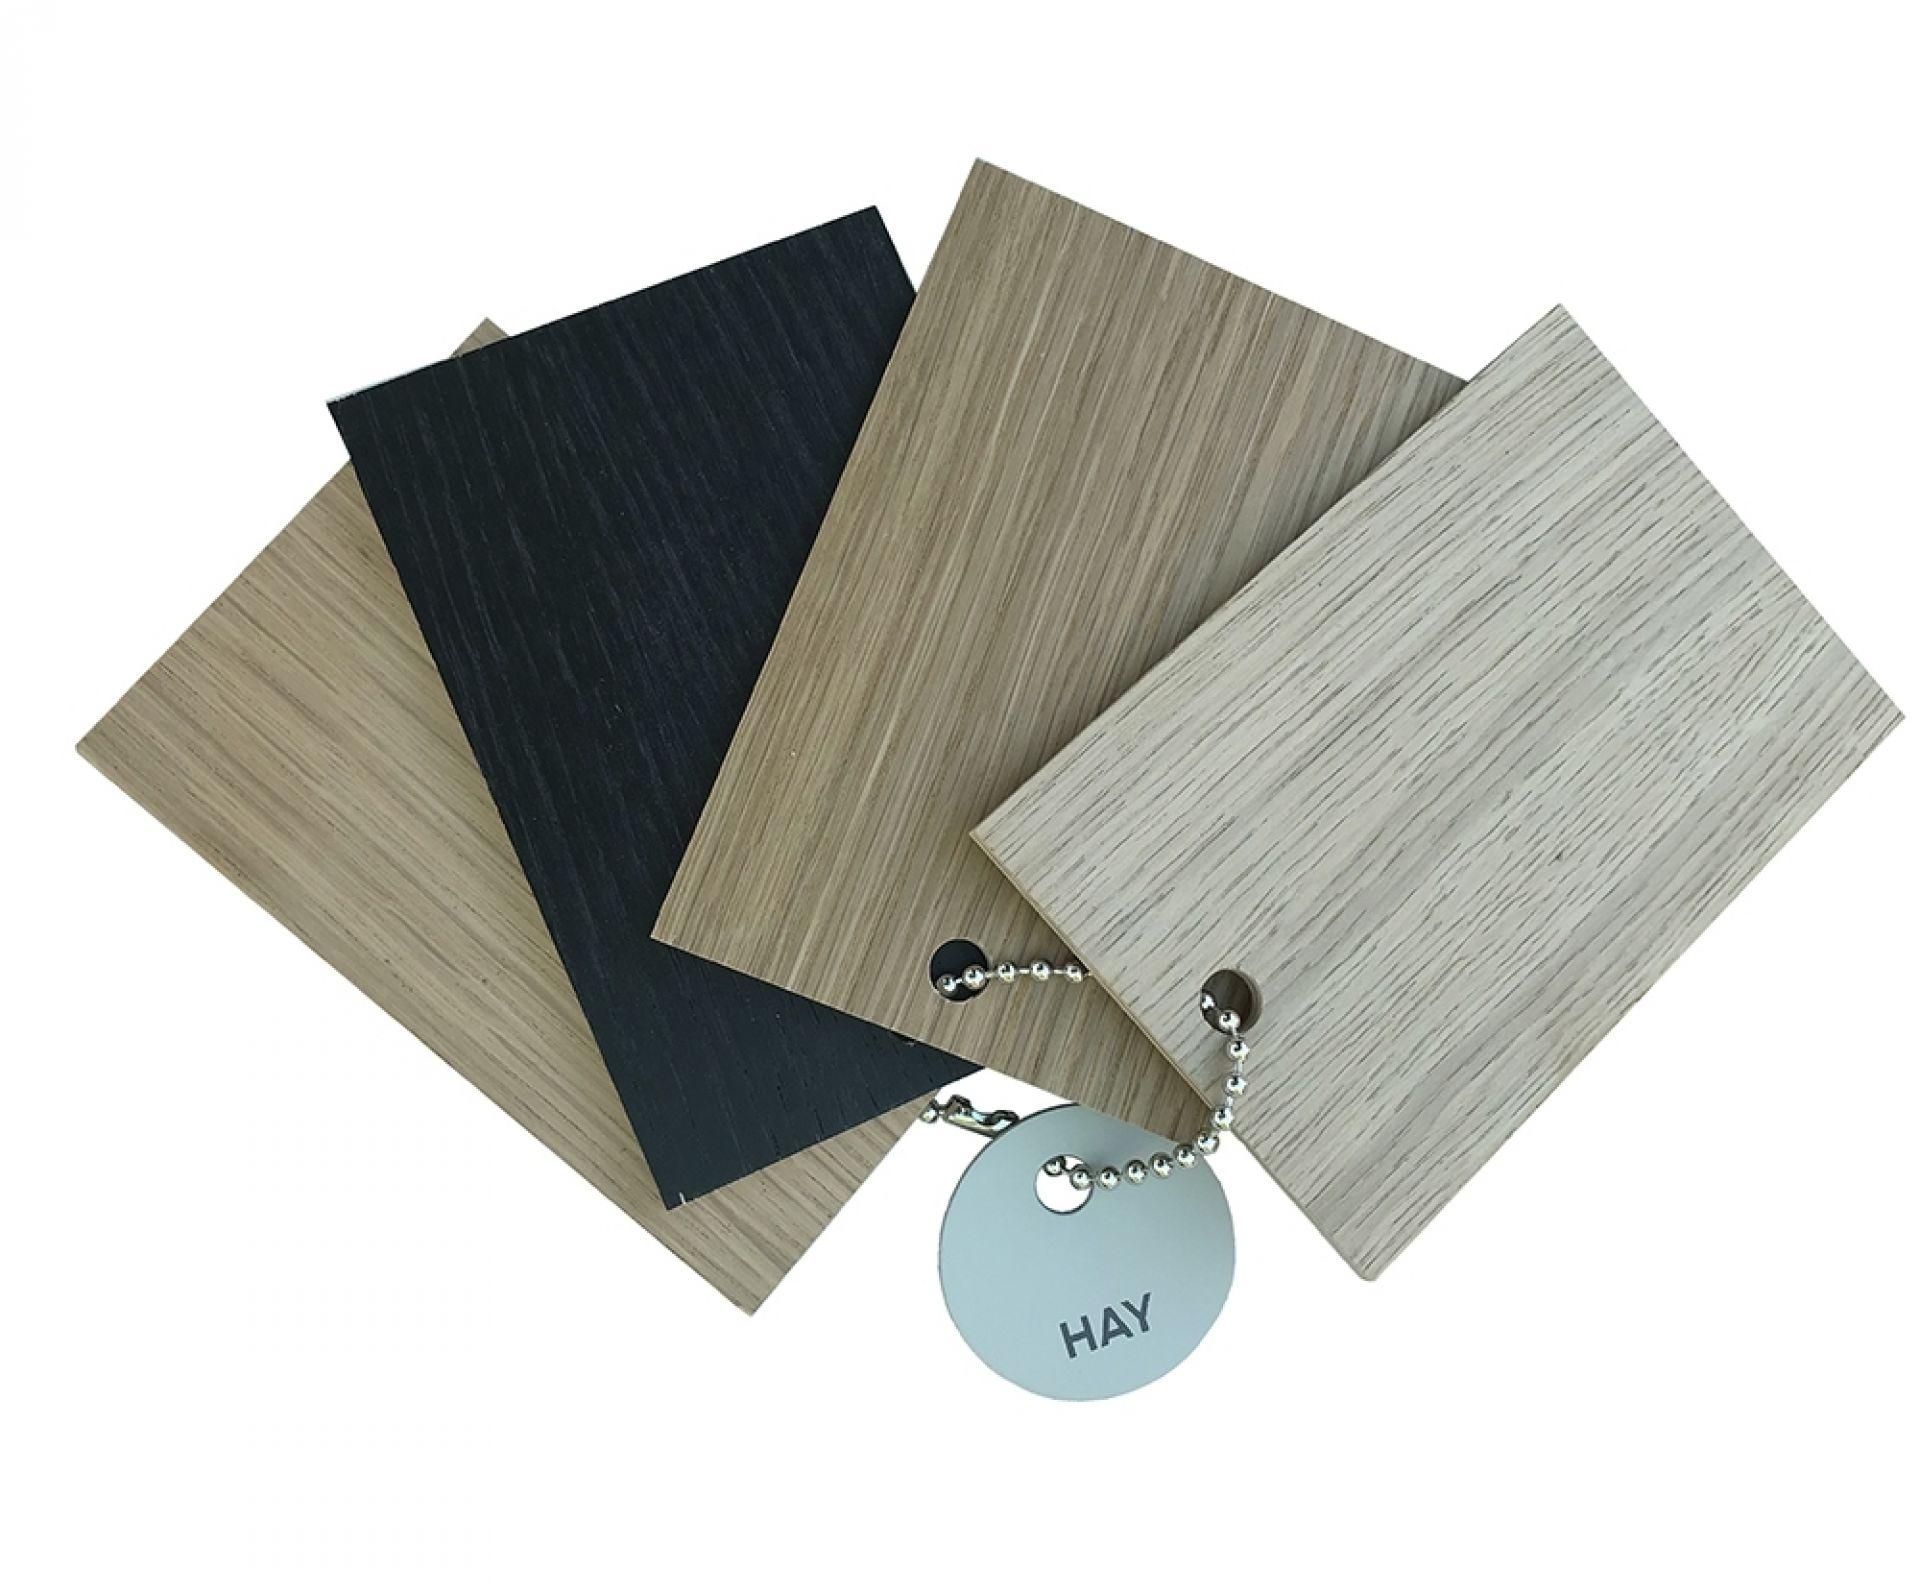 Wood sample for CPH HAY